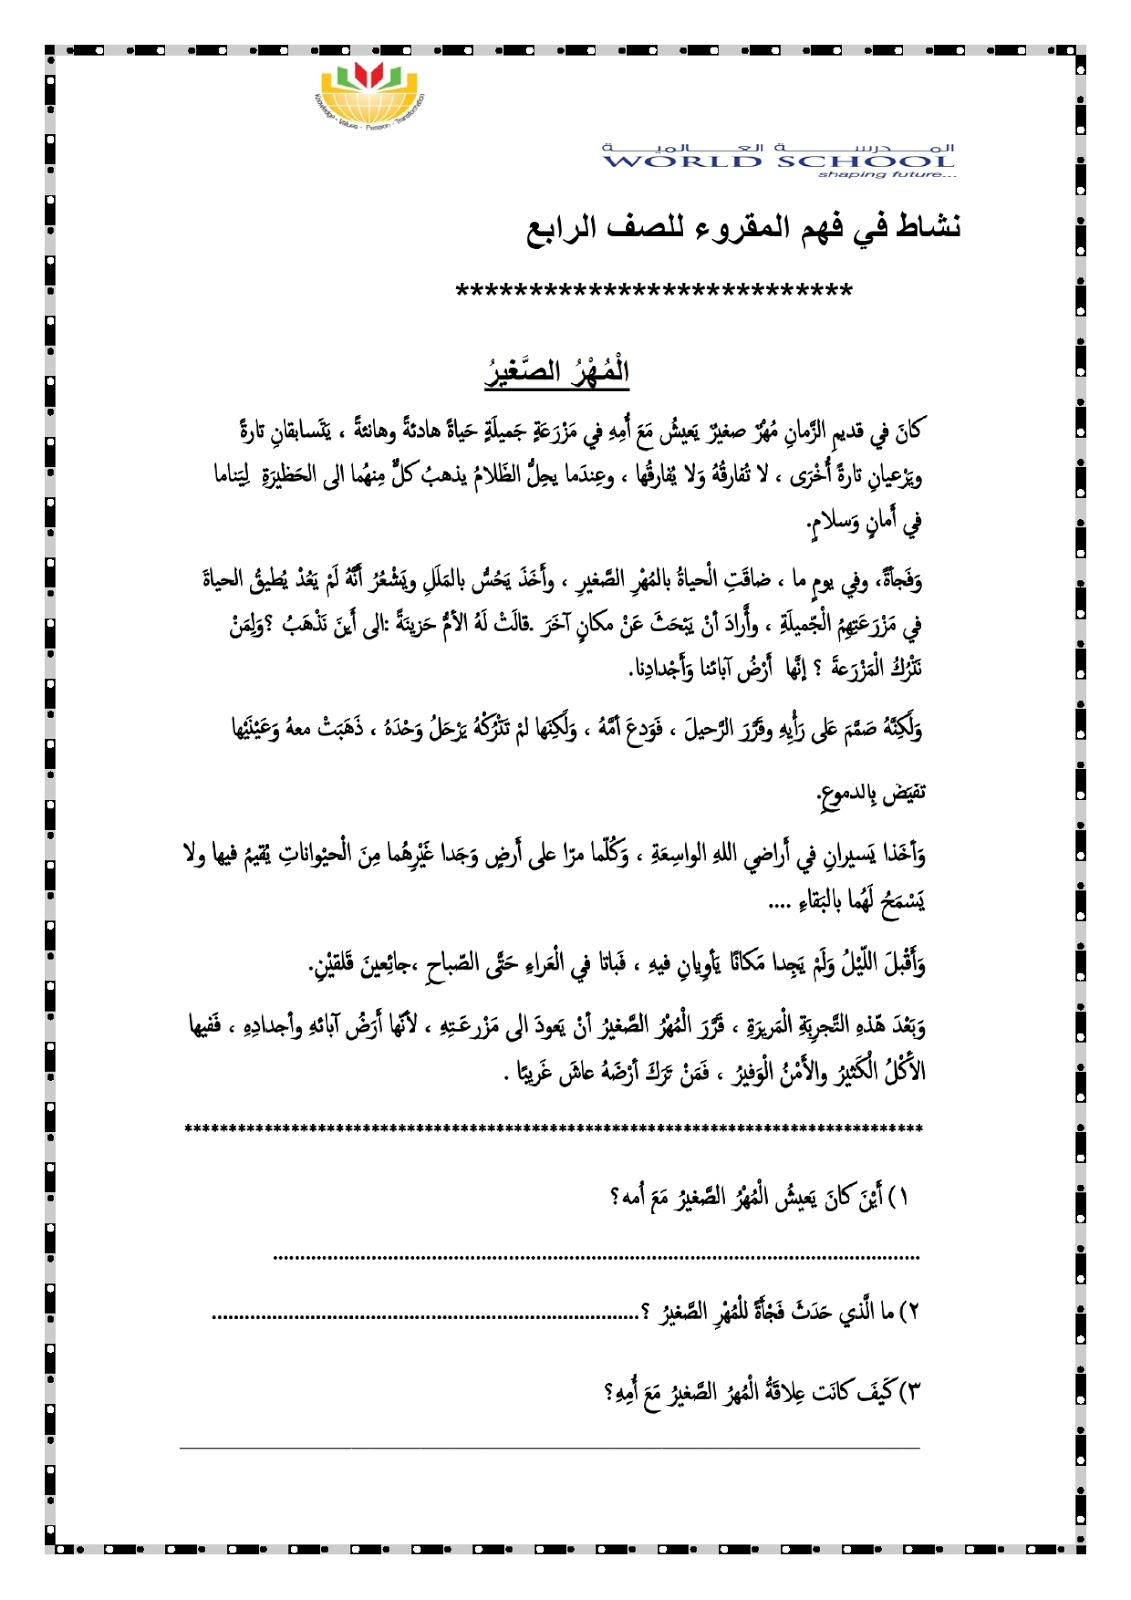 Third Grade Arabic Worksheet   Printable Worksheets and Activities for  Teachers [ 1600 x 1131 Pixel ]